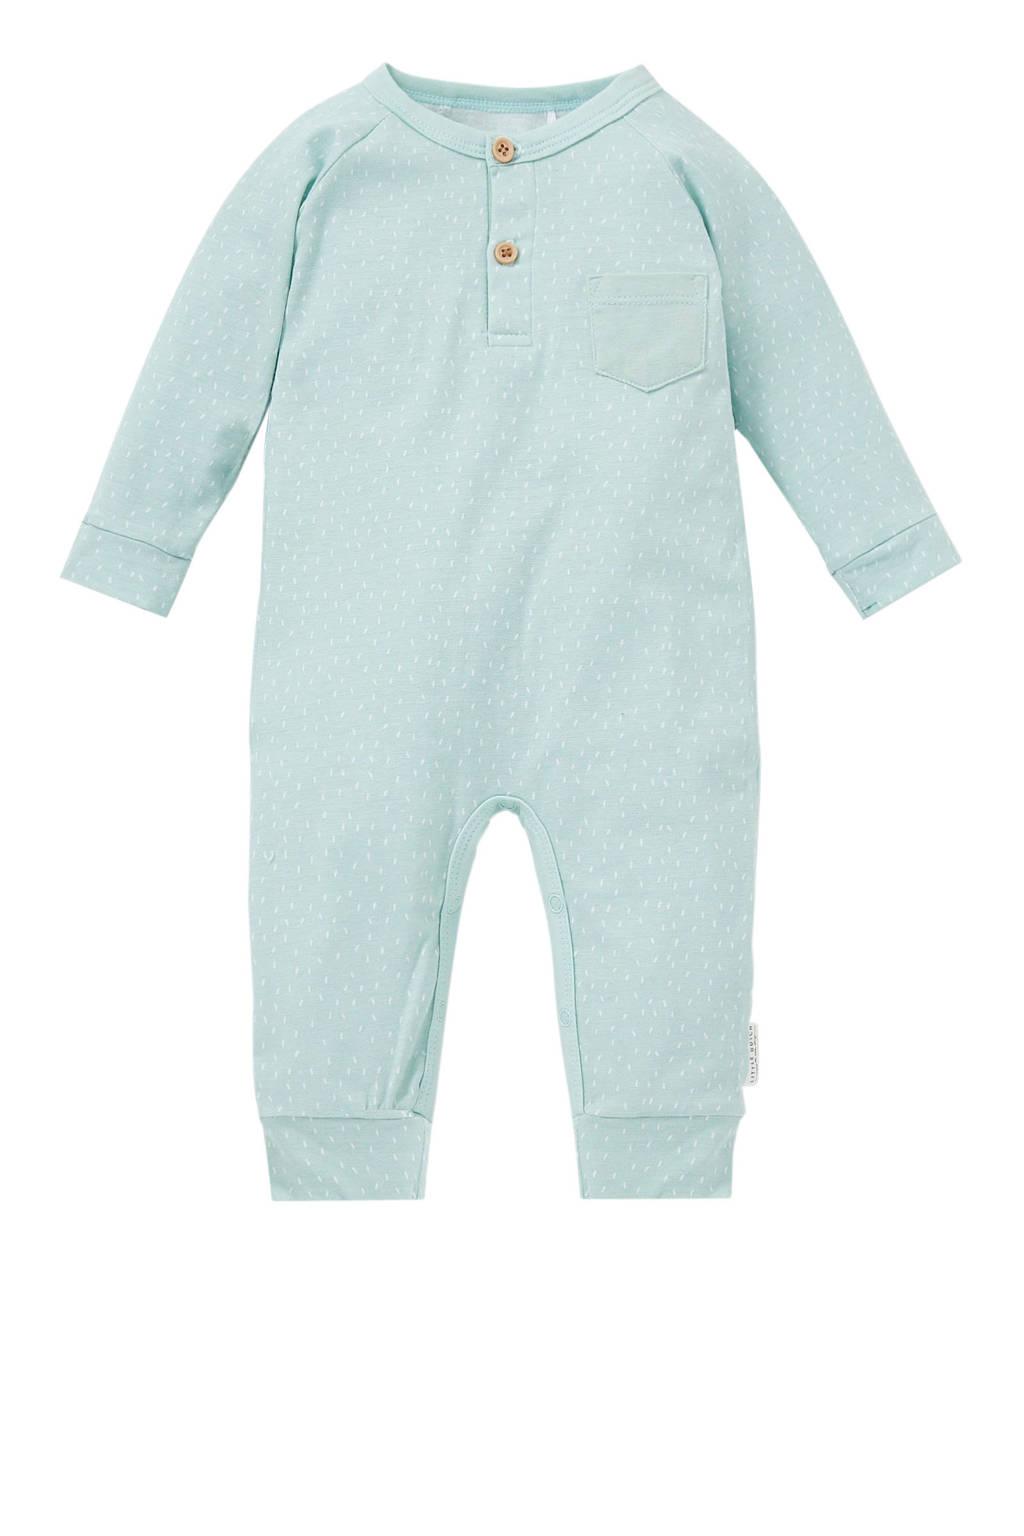 Little Dutch newborn baby boxpak, Mintgroen